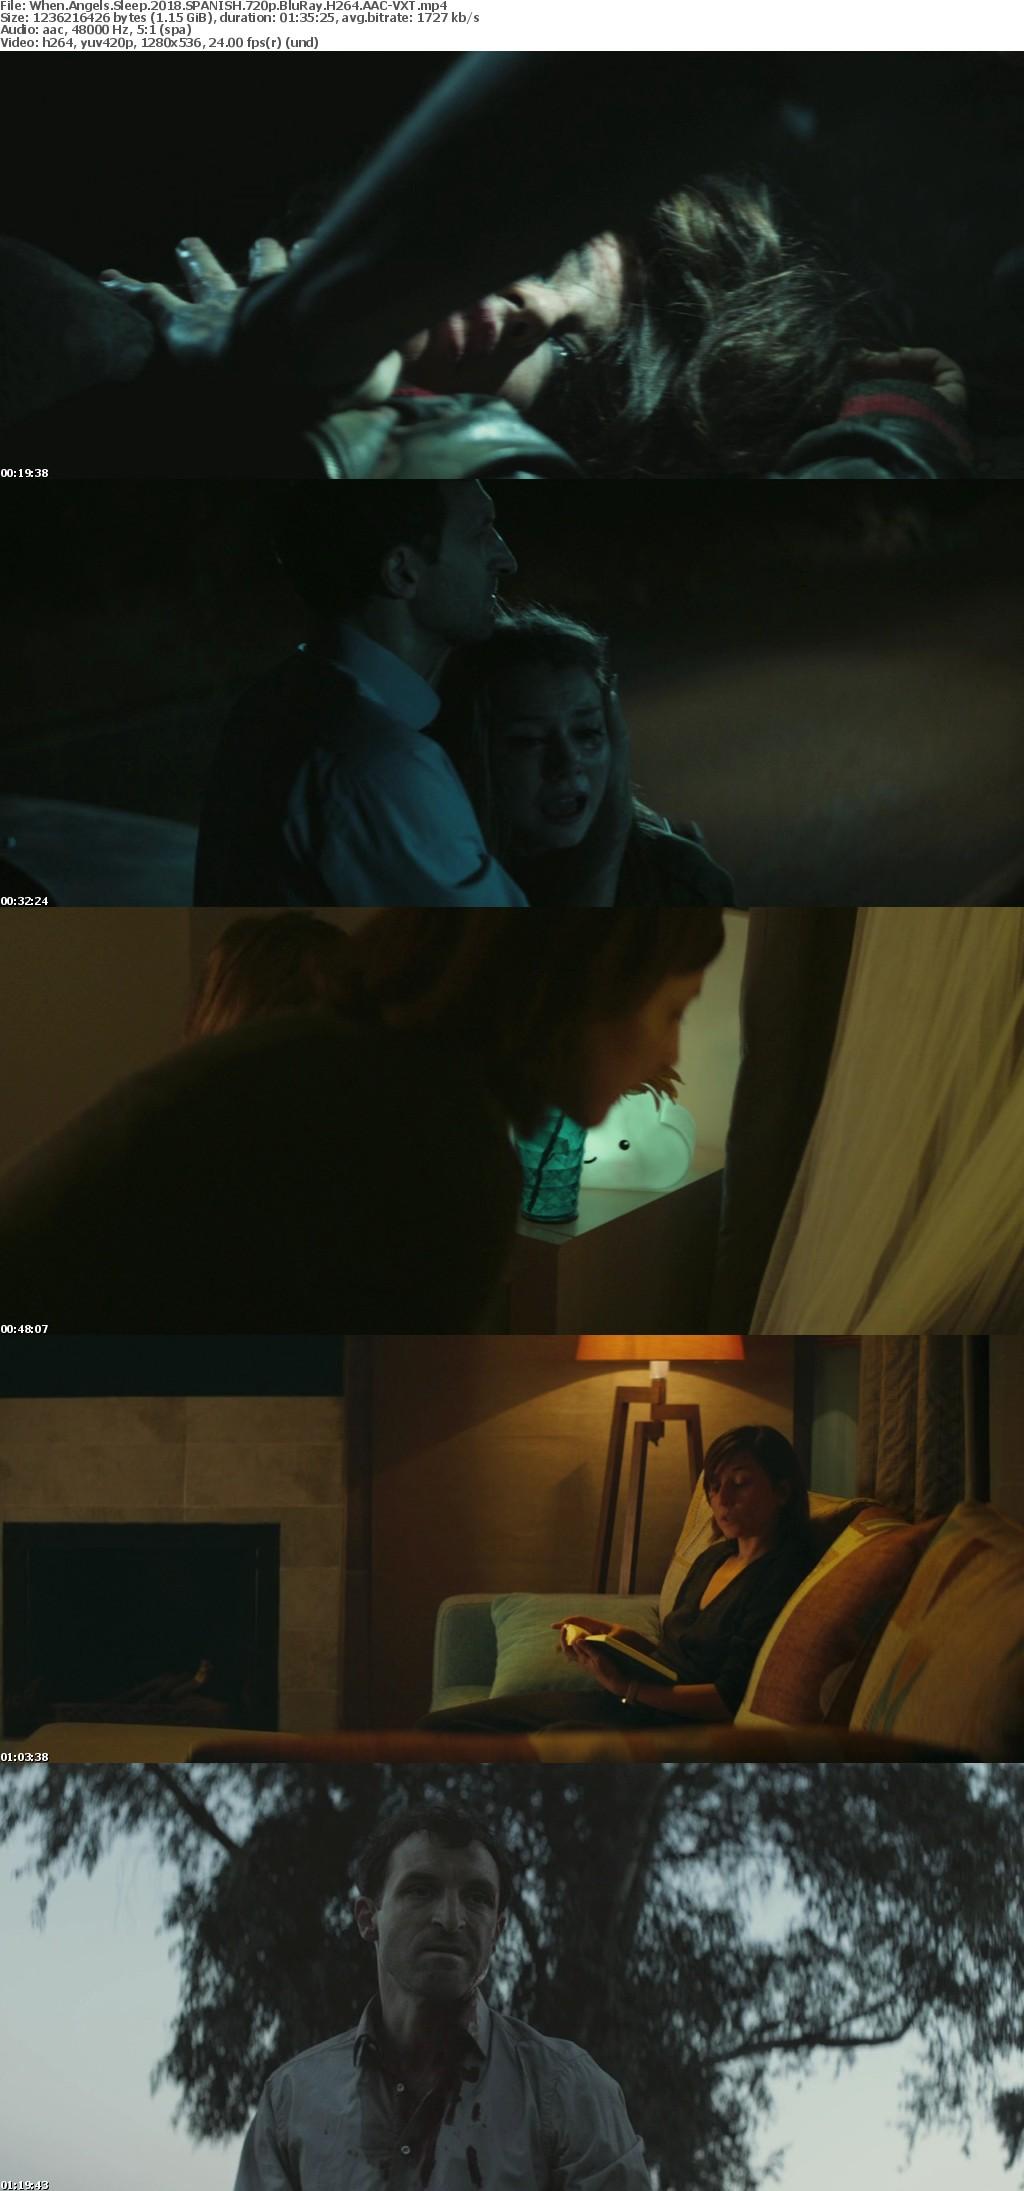 When Angels Sleep 2018 SPANISH 720p BluRay H264 AAC-VXT